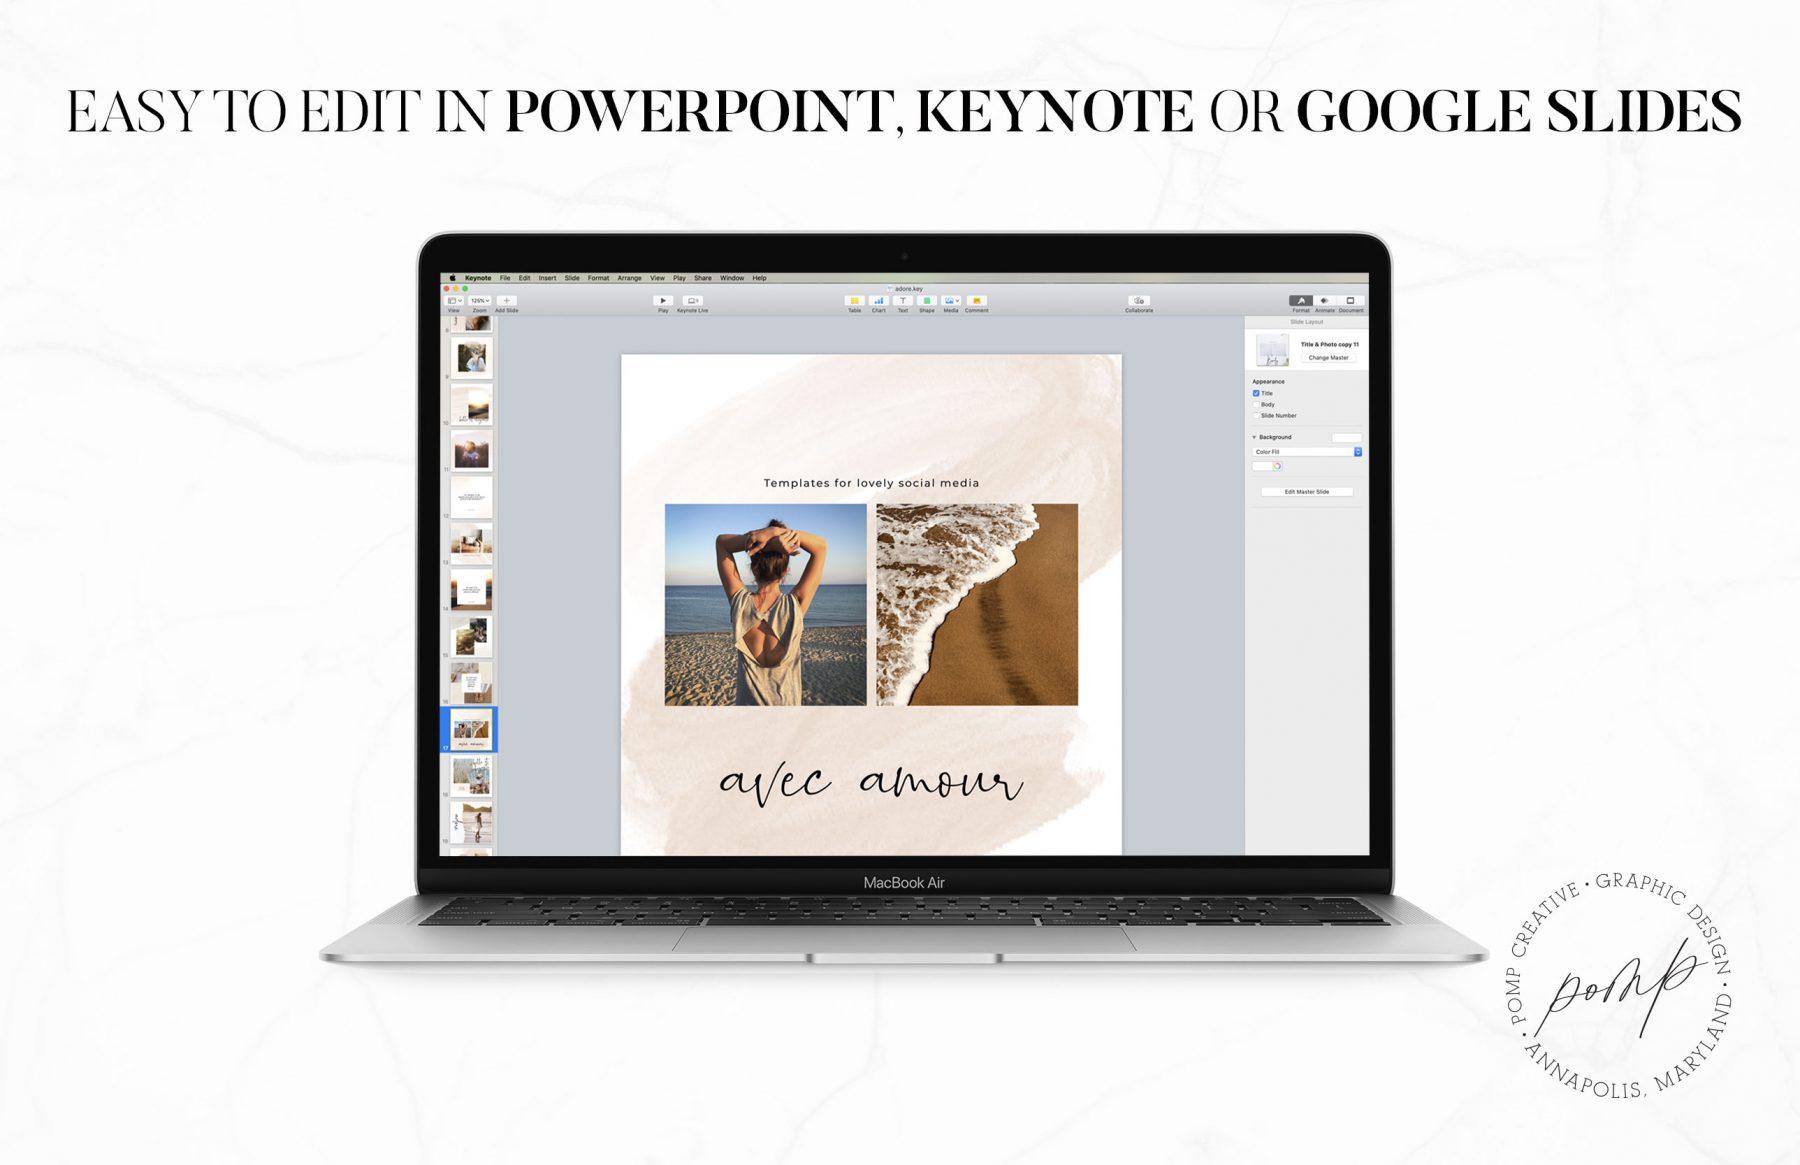 Social Media Templates; Instagram; Ladypreneur; Entrepreneur; Powerpoint Templates; Instagram Templates; Pinterest; Keynote Templates